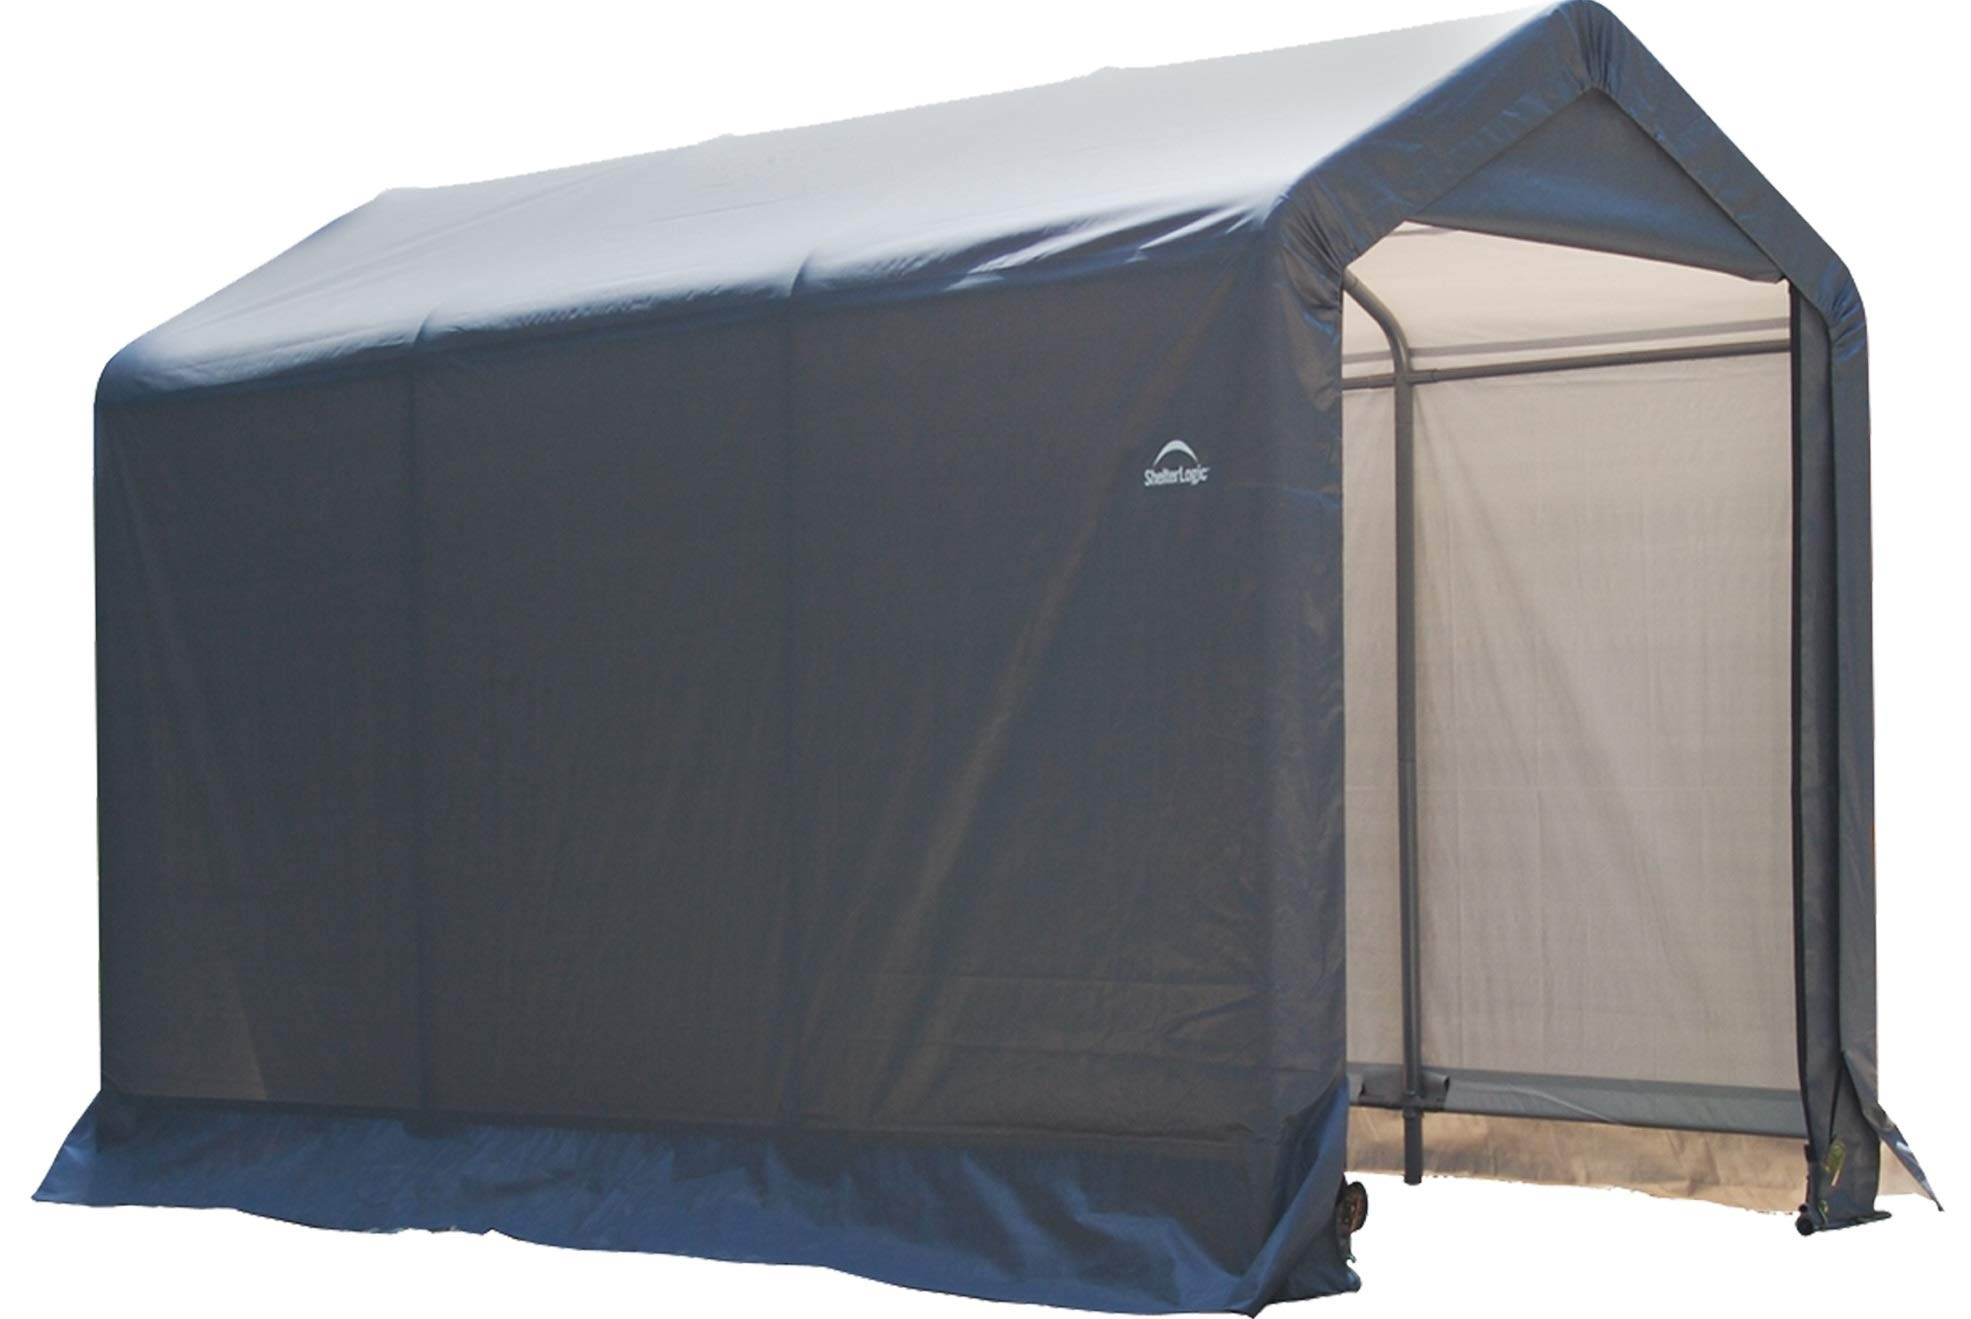 ShelterLogic 6' x 10' Shed-in-a-Box All Season